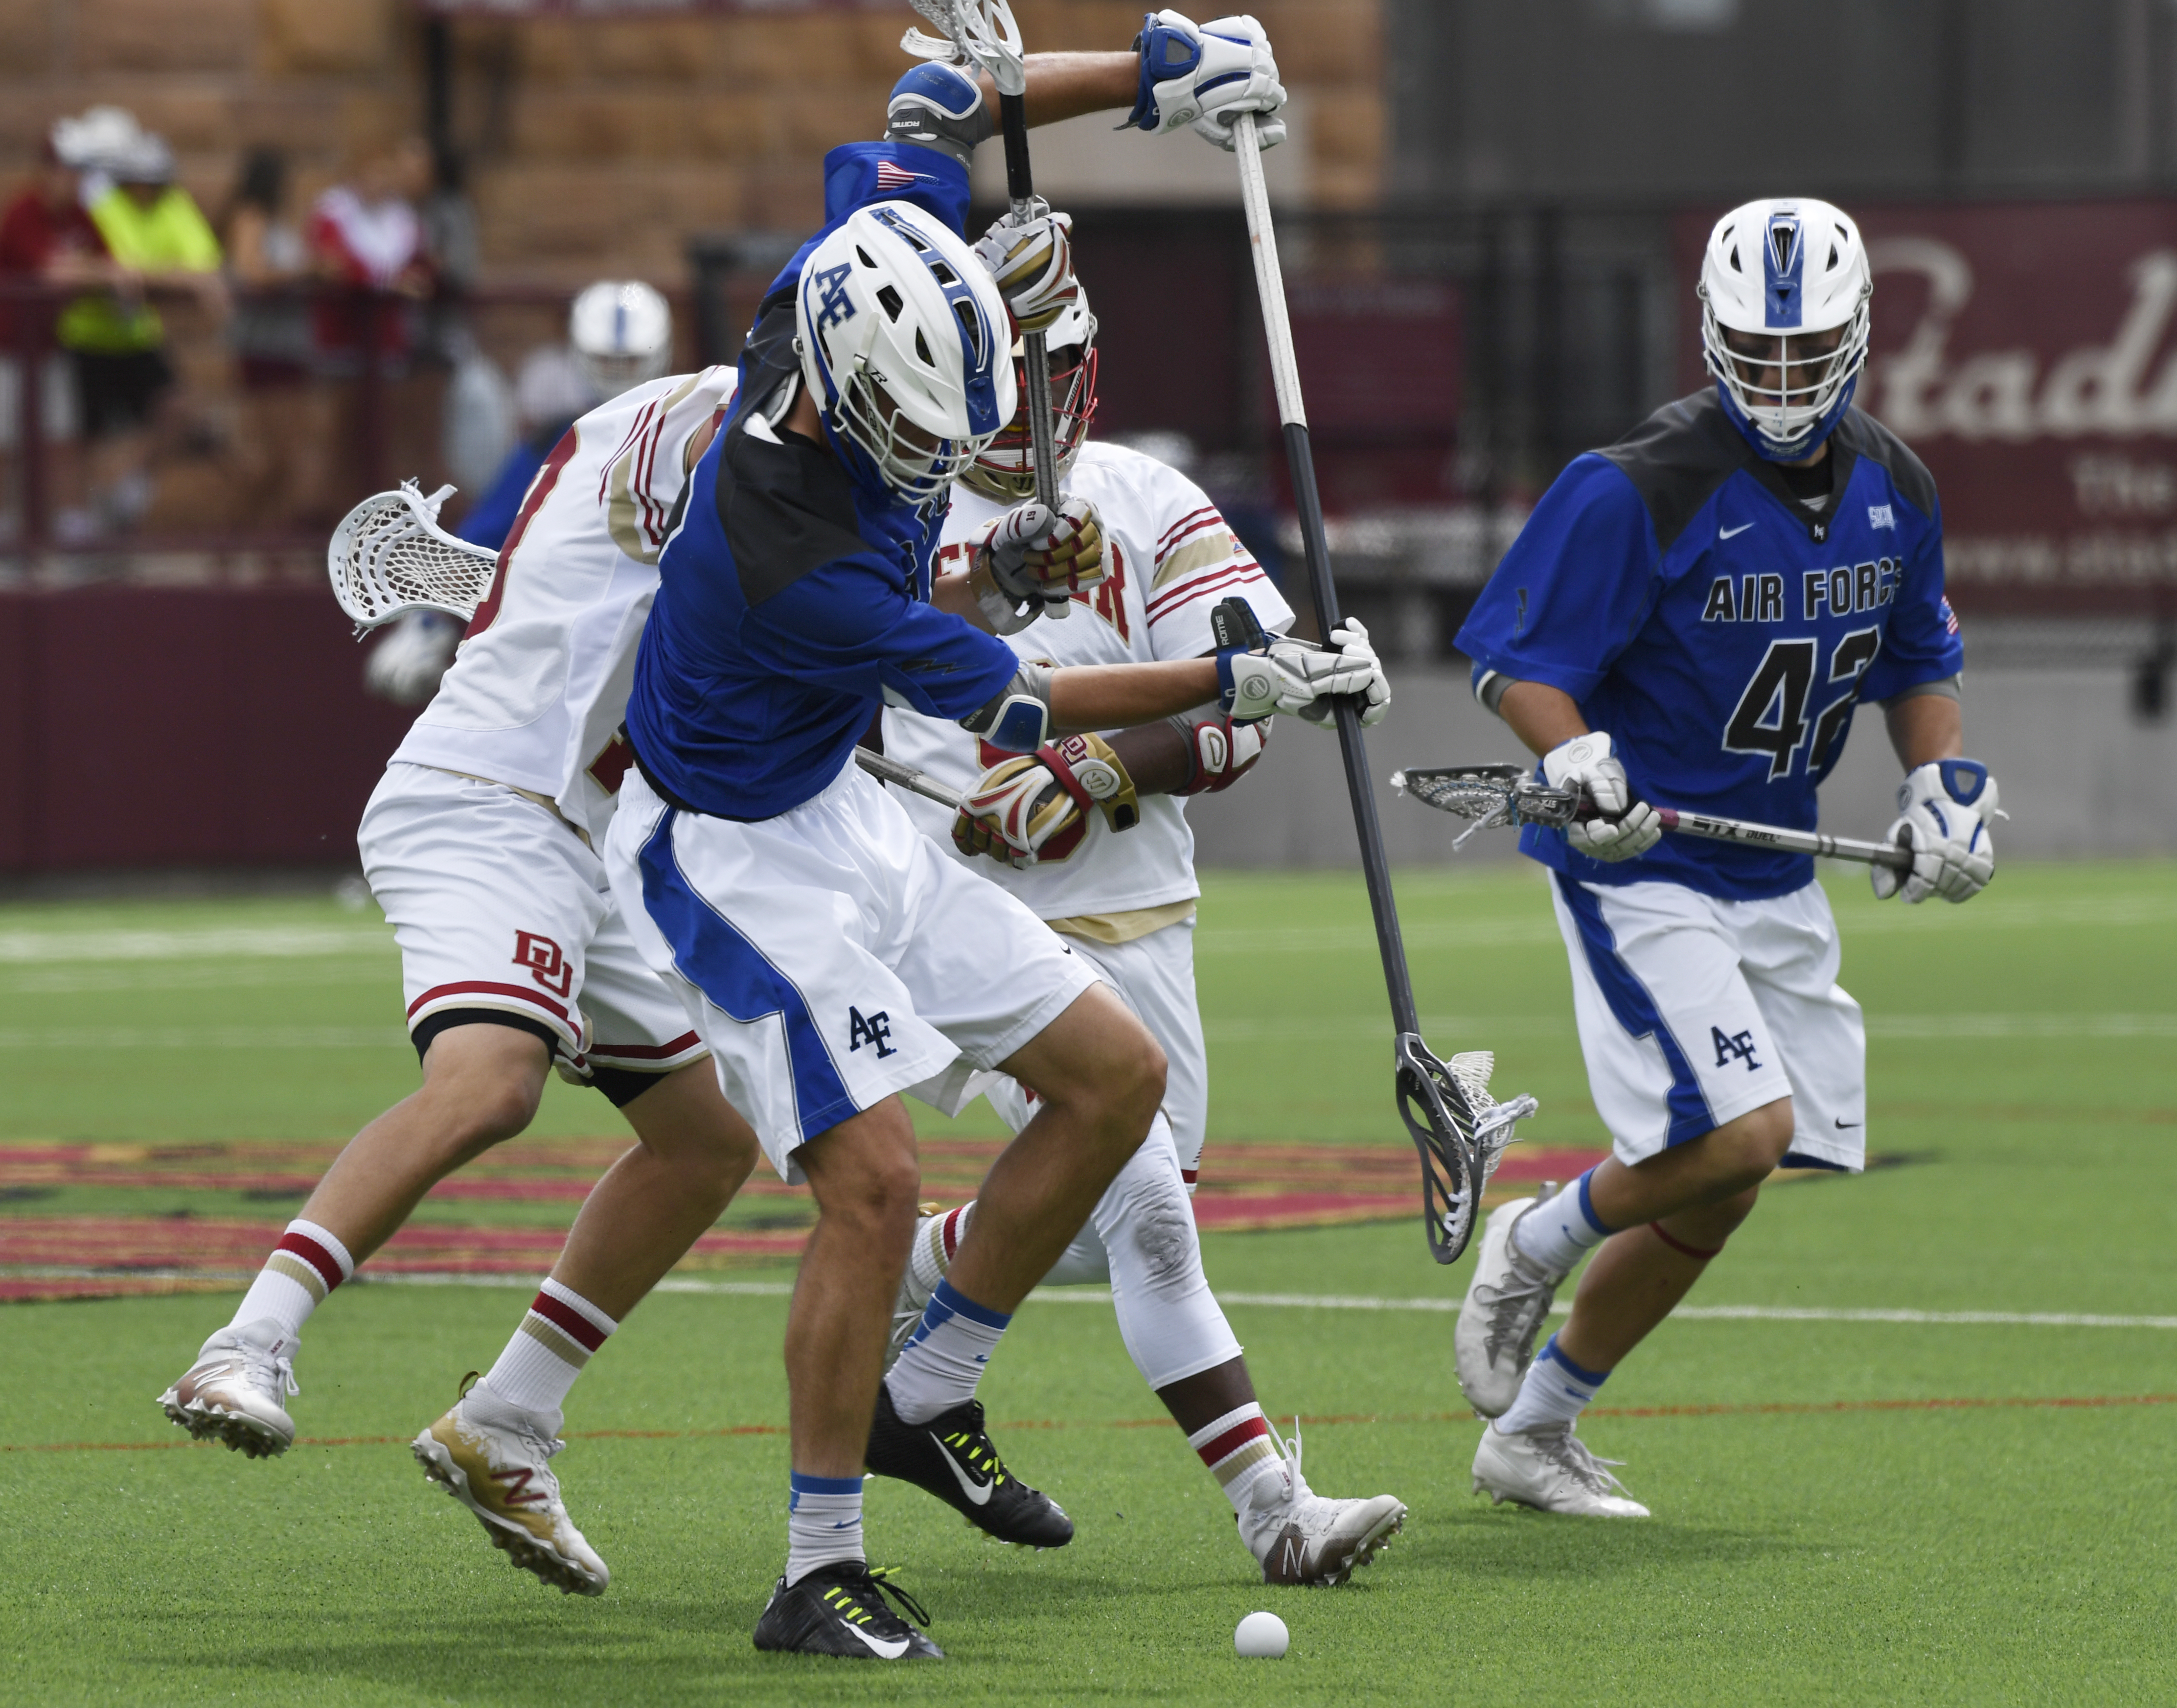 Denver University vs Air Force lacrosse